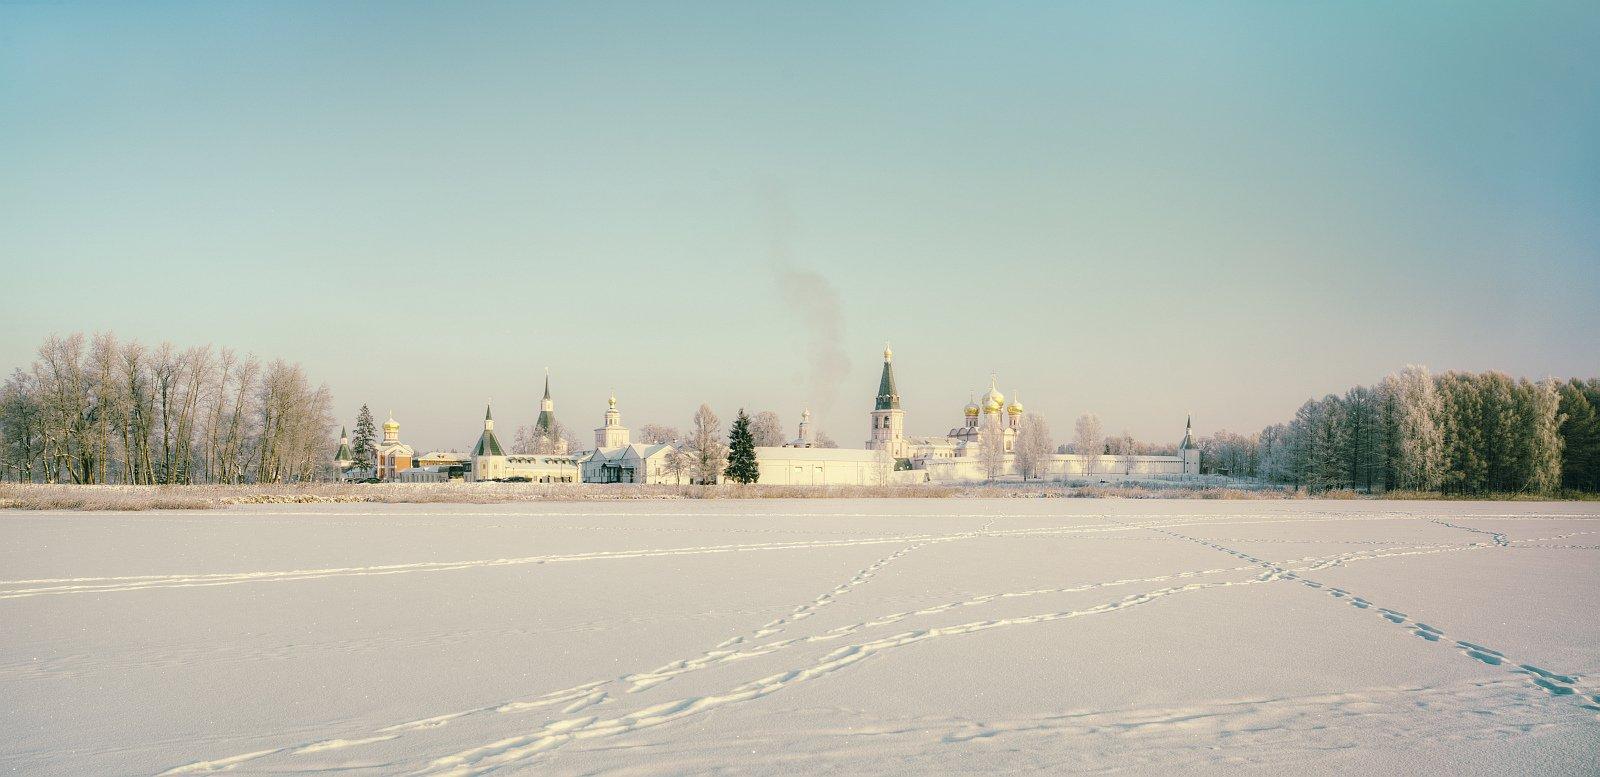 Пейзаж, природа, Валдай, зима, утро, монастырь, панорама, Ефимов Александр